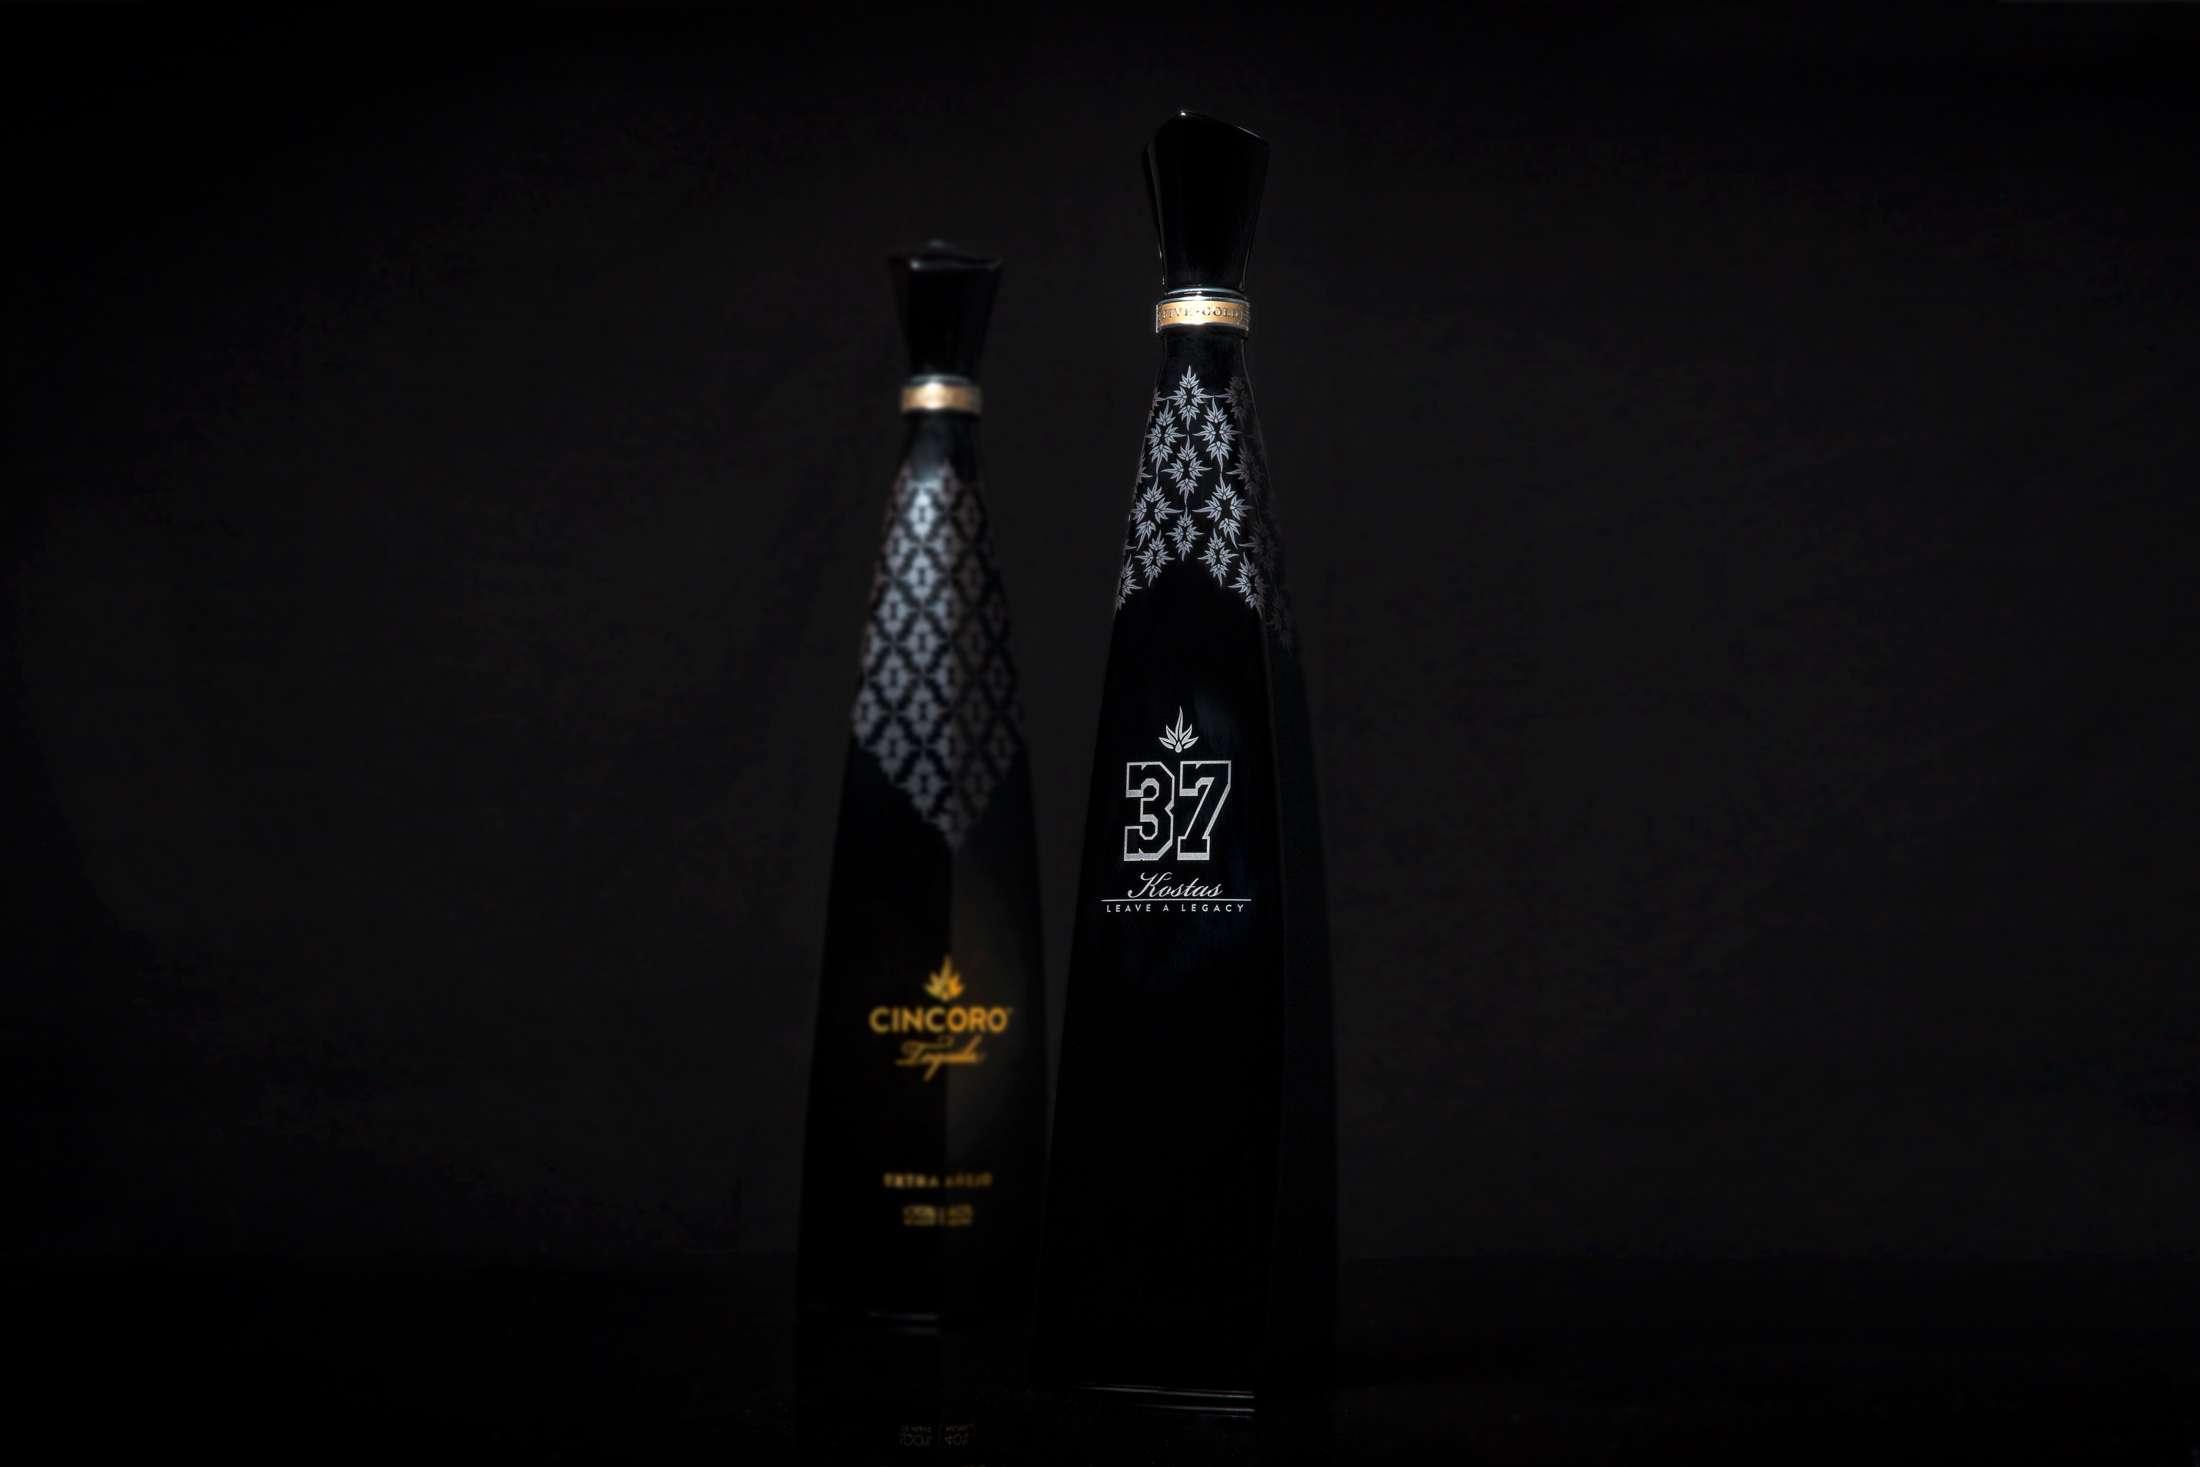 Bottle Photography for Cincoro Tequila shot on black of engraved bottles.